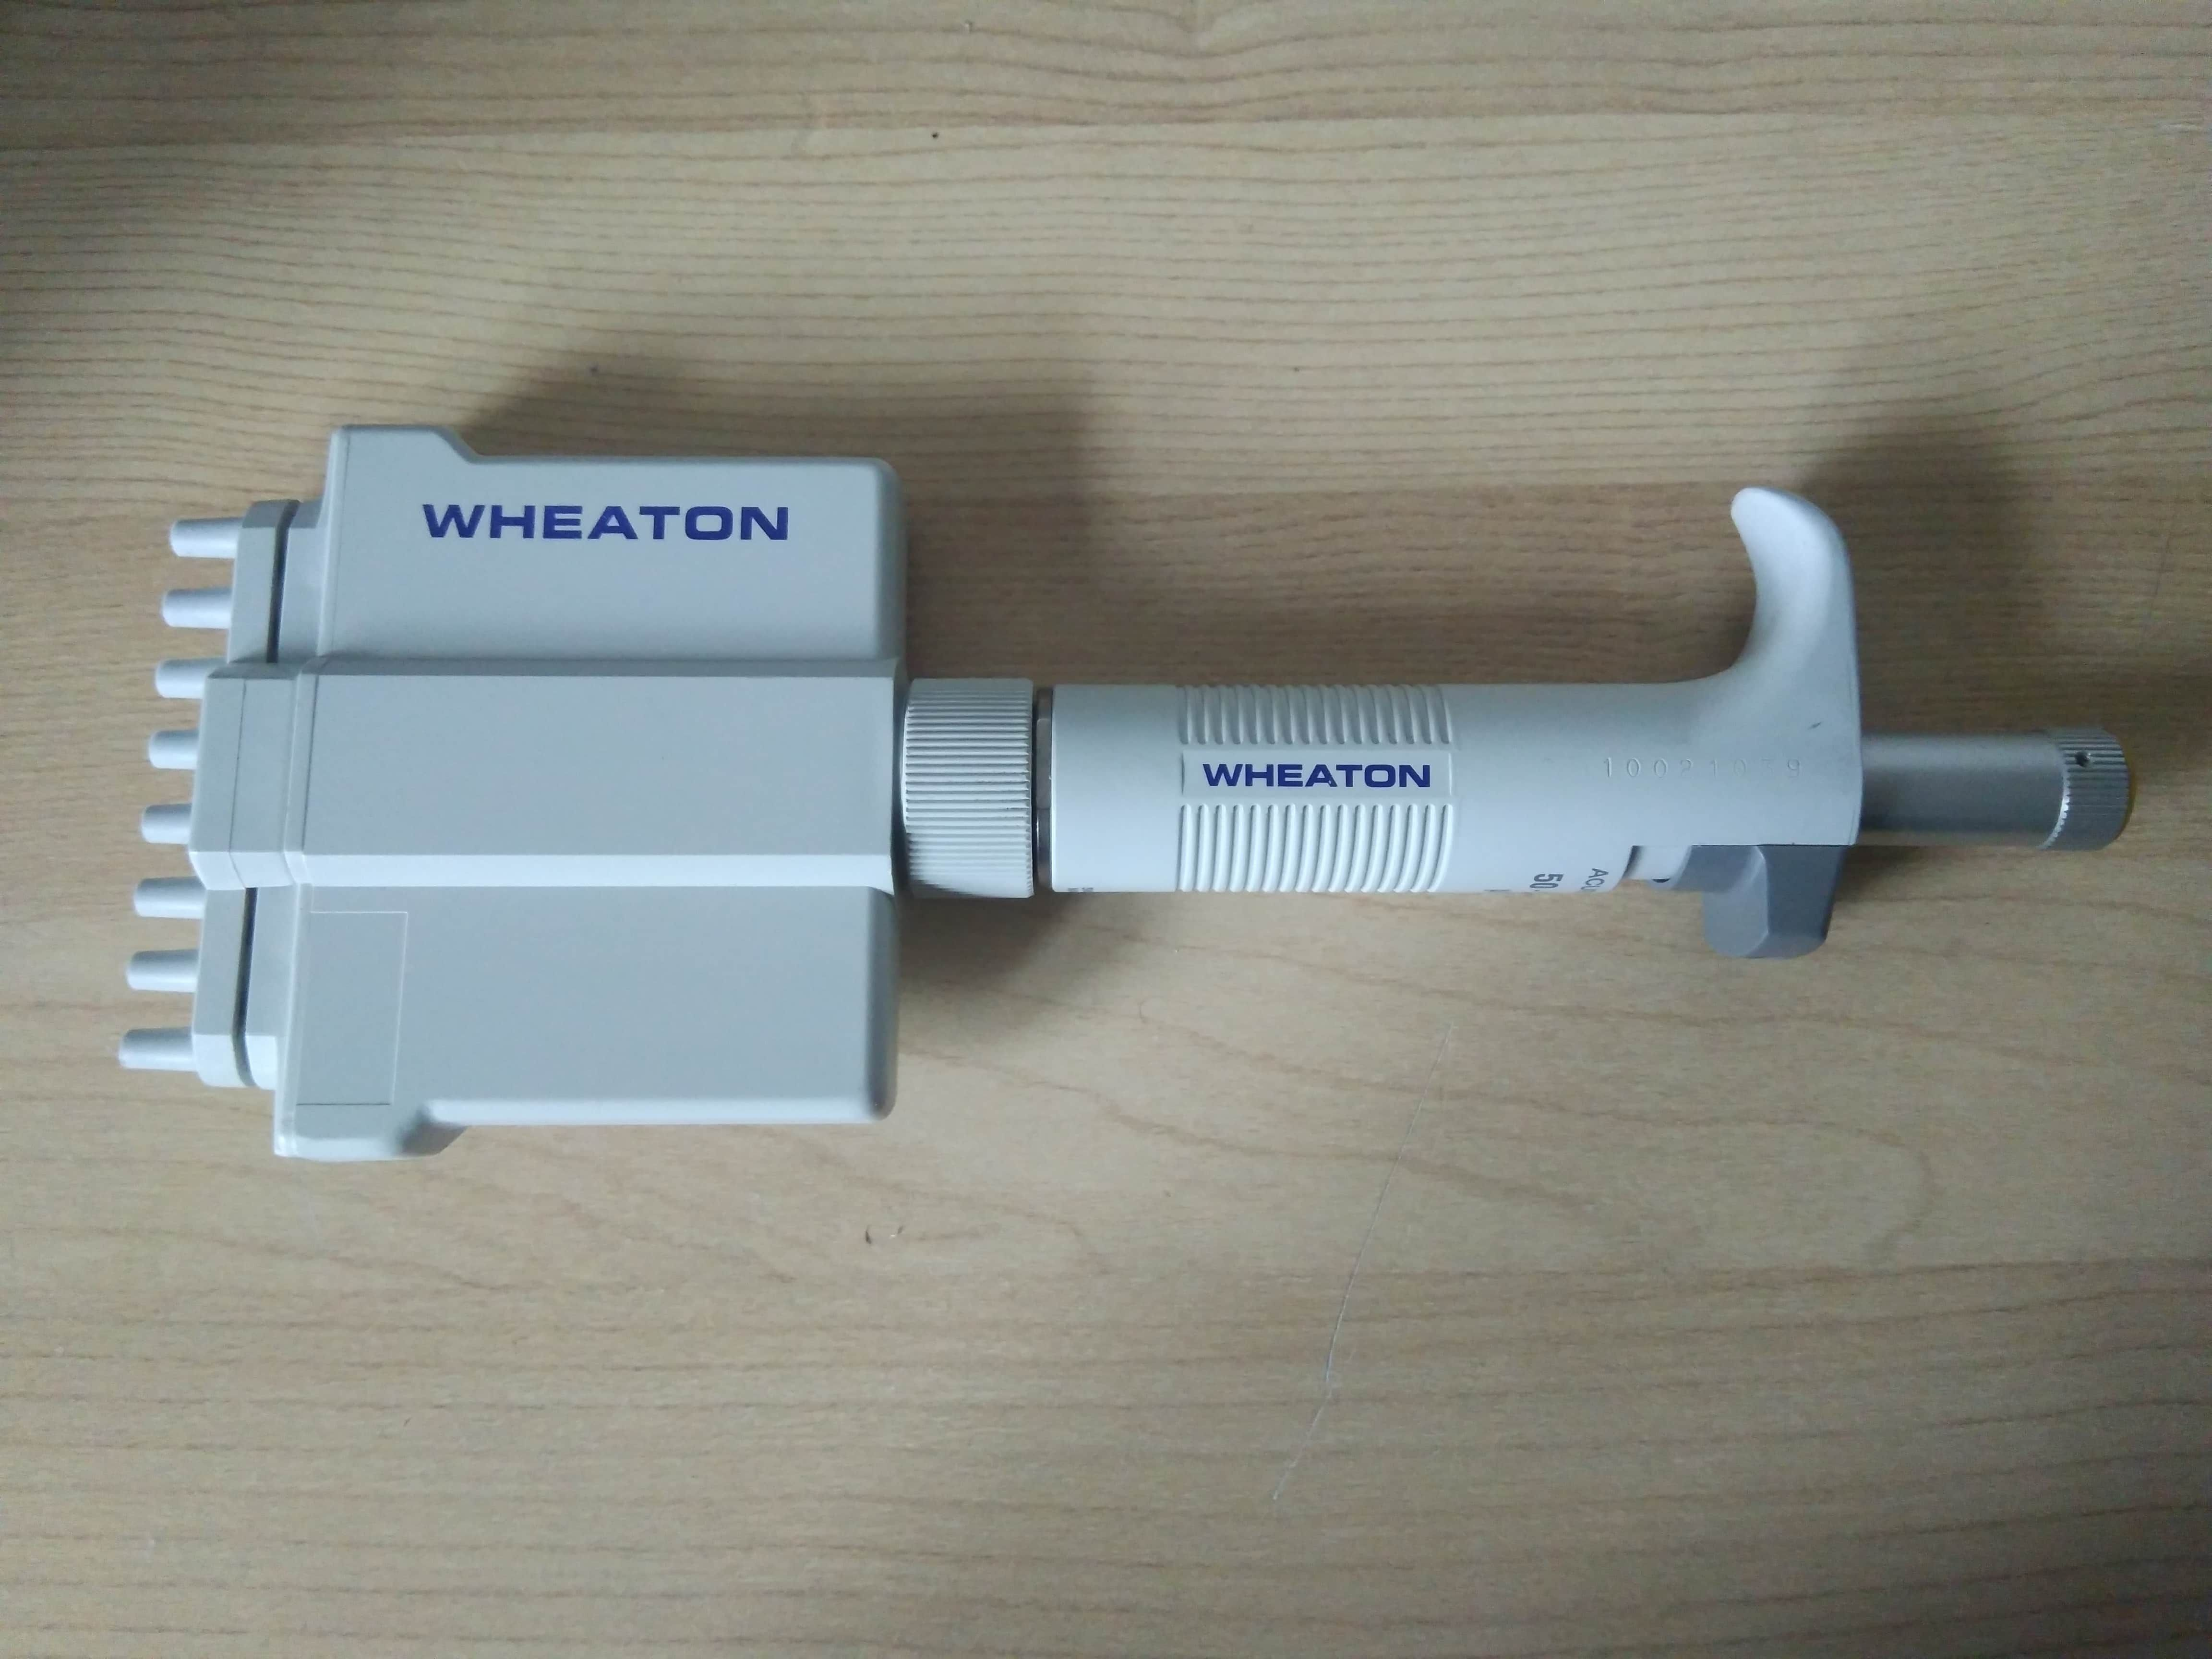 Wheaton Acura 851 8 Channels Adjustable volume Pipette 50-200 ul